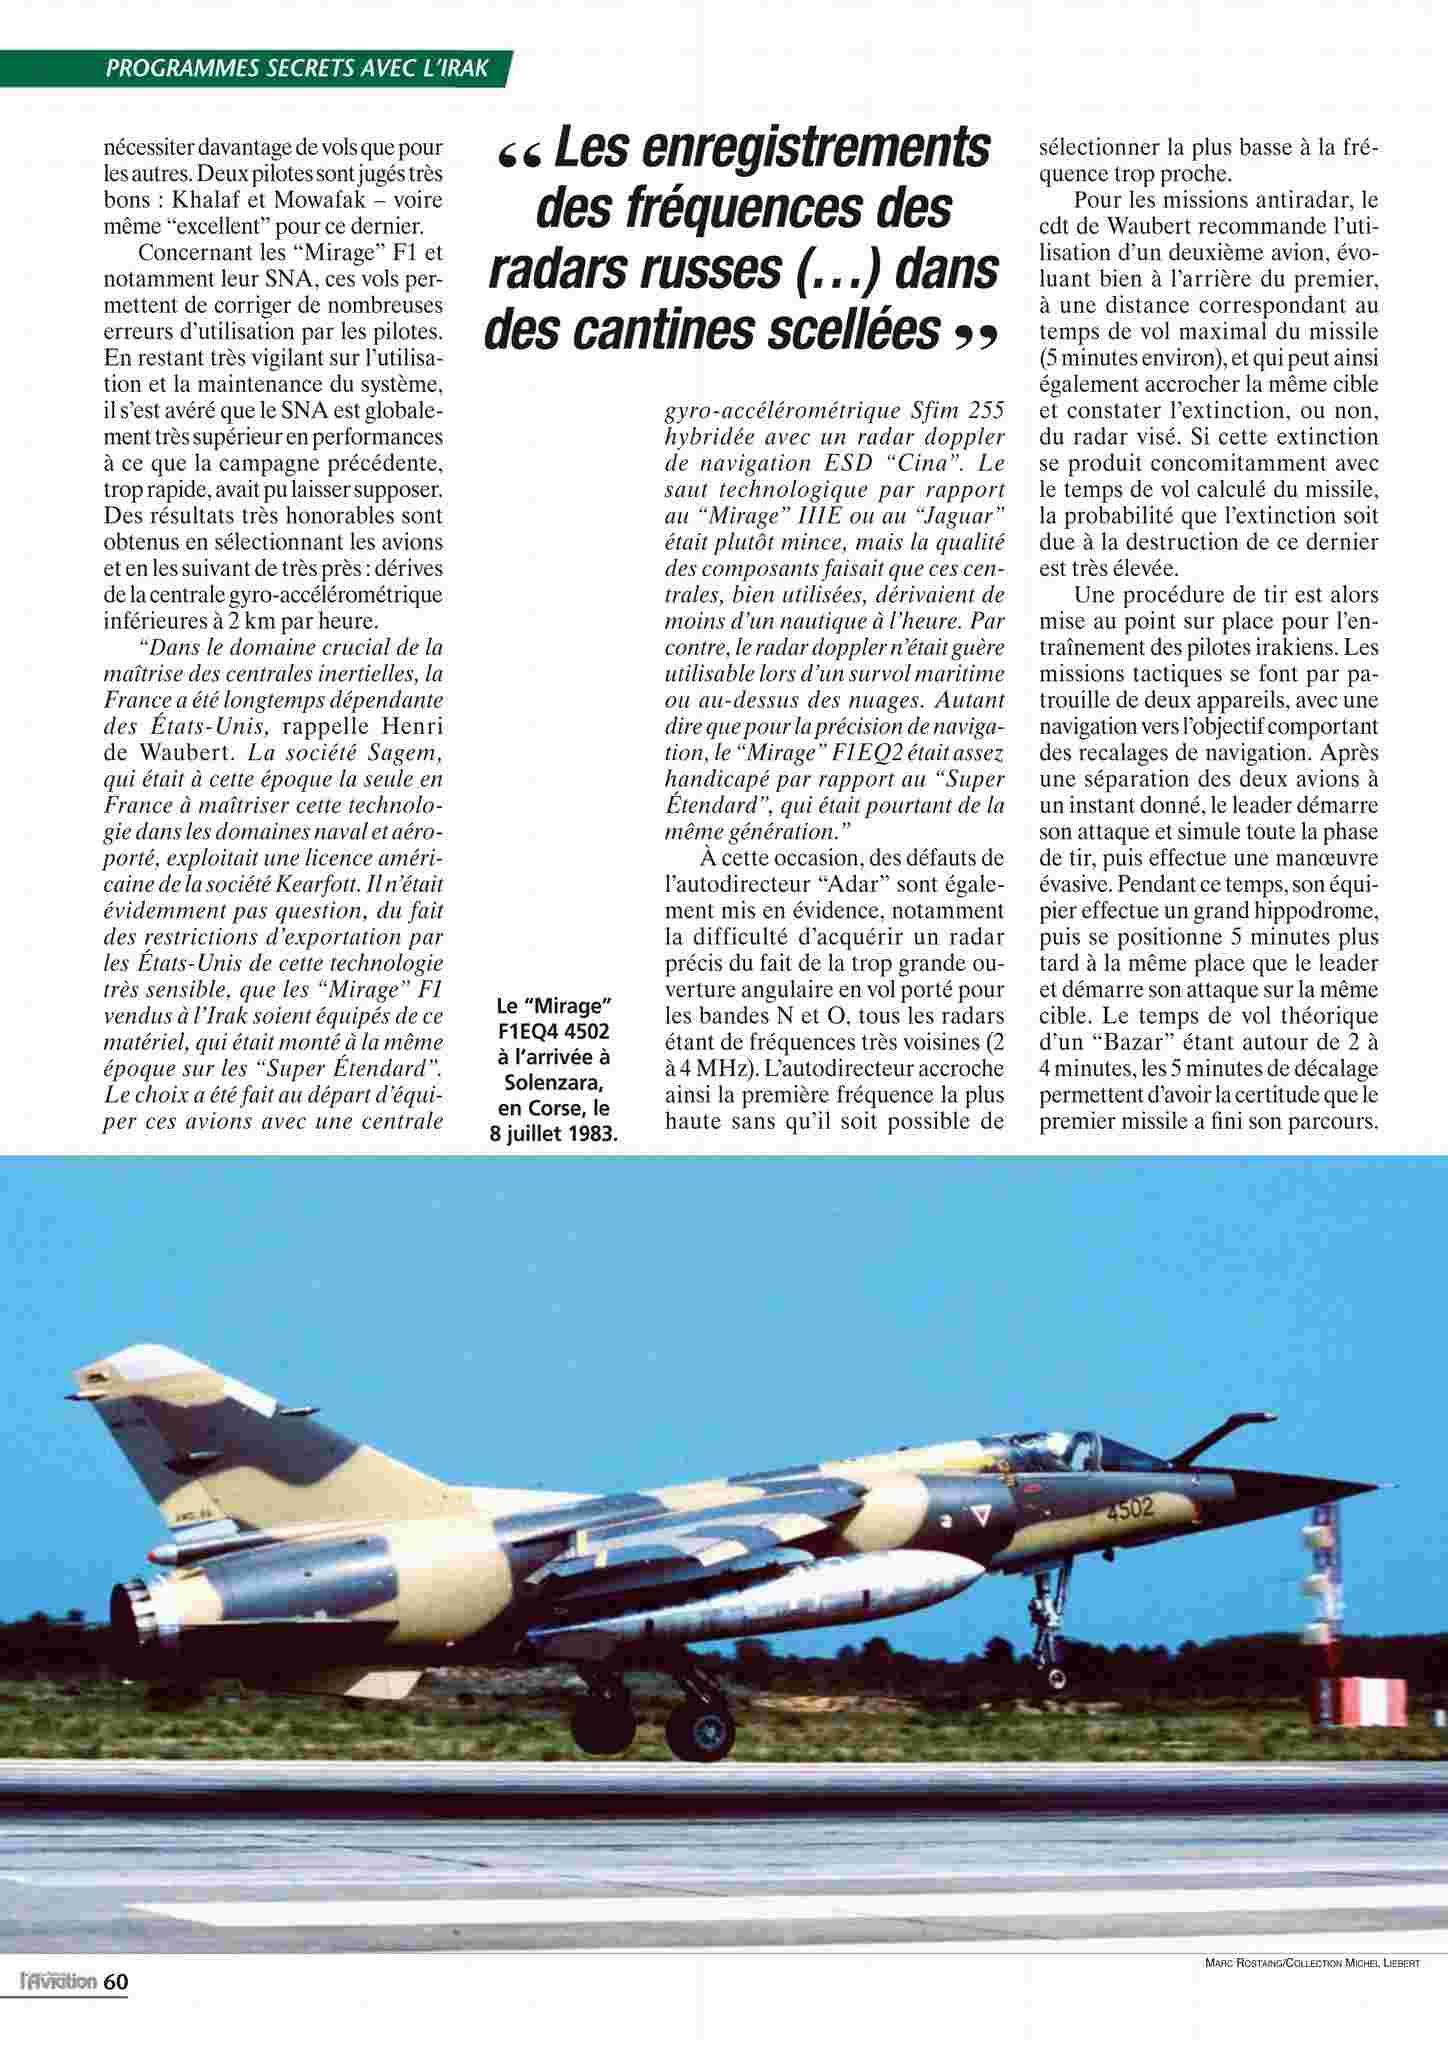 Guerre Iran-Irak - Page 3 A03610